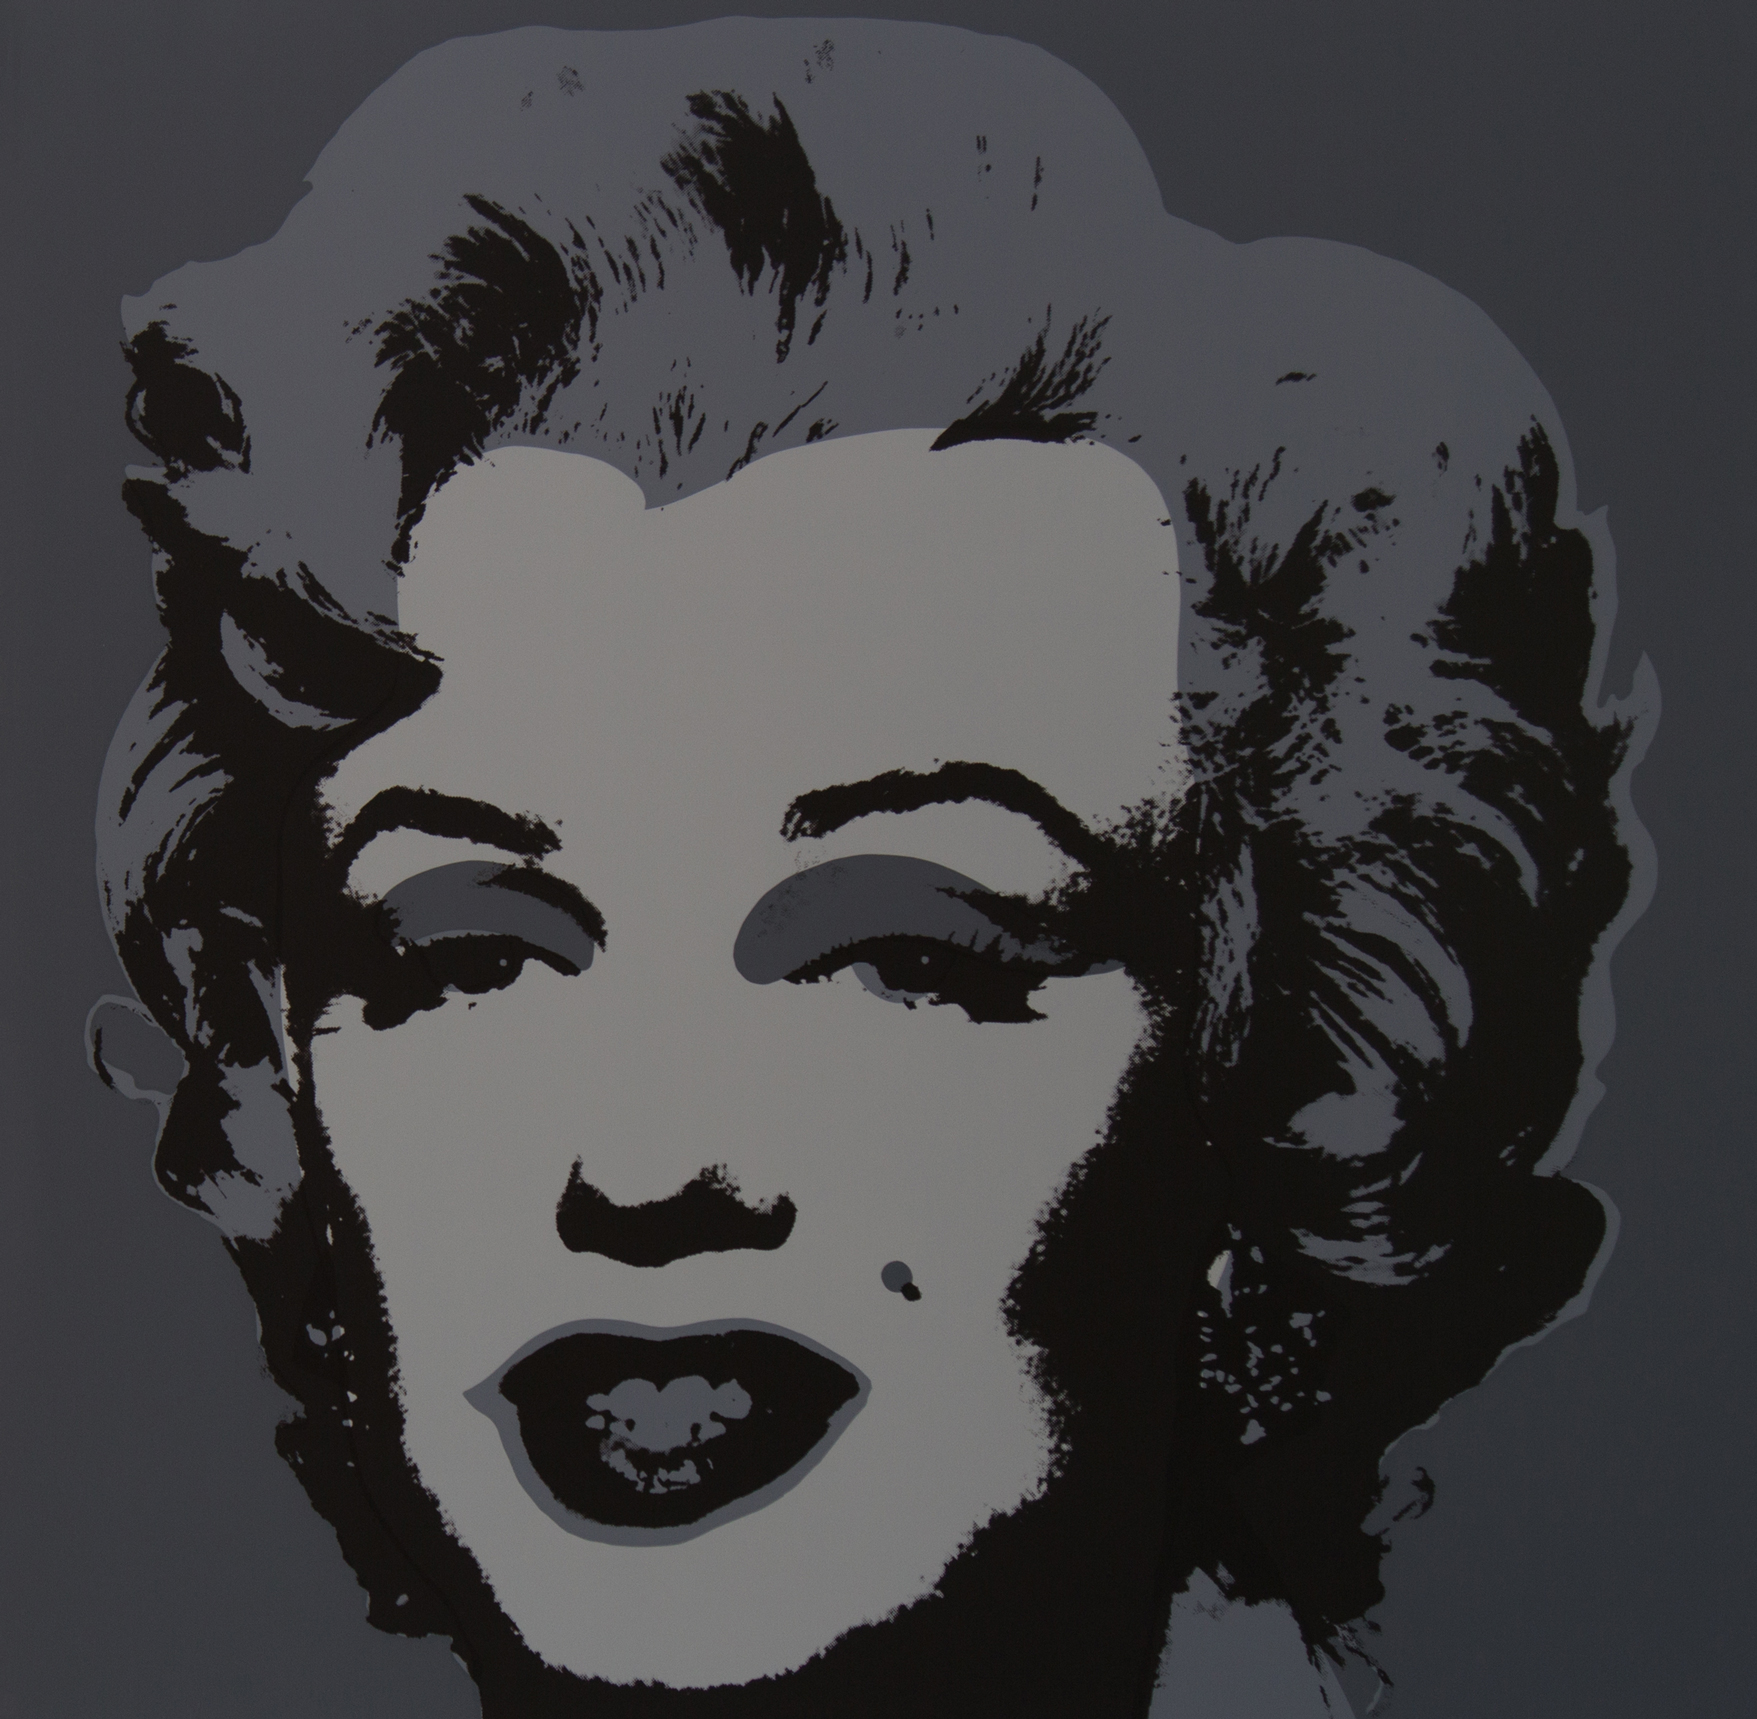 11.24: Marilyn Monroe